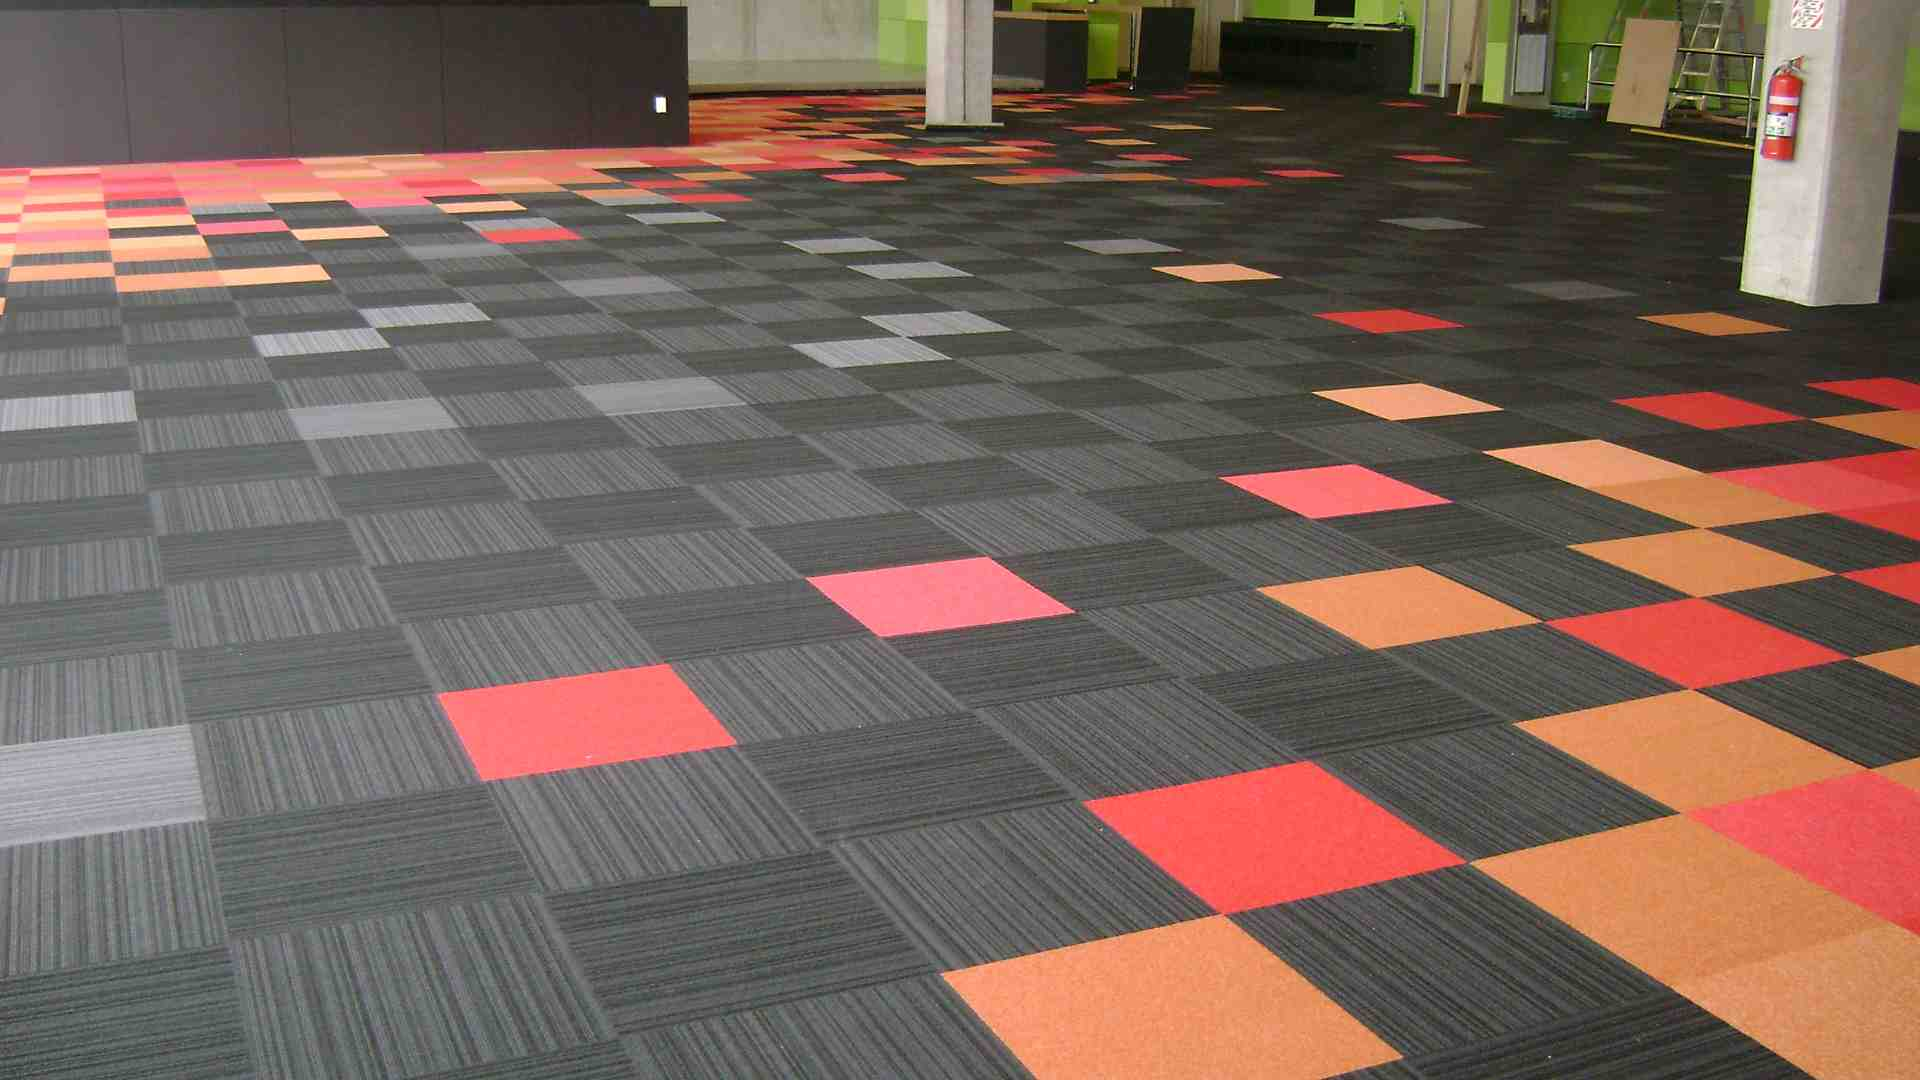 floor carpet more related posts: ZPIXJMK